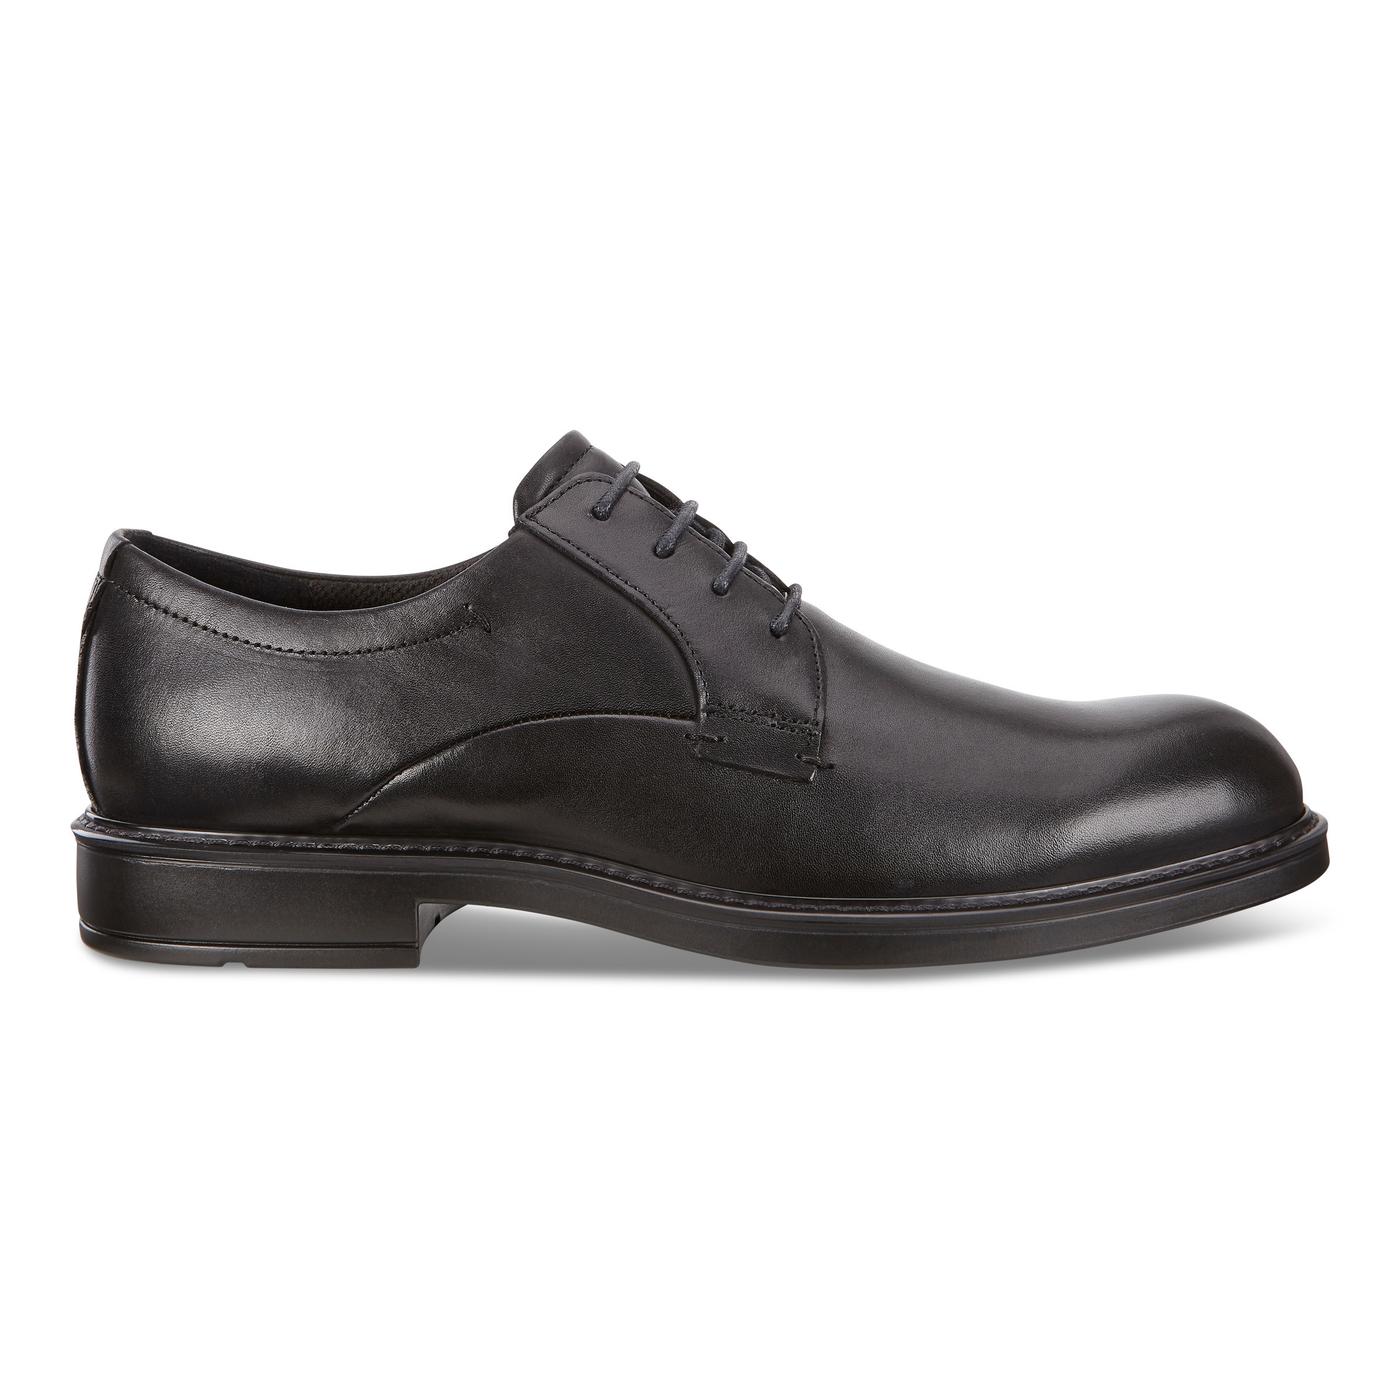 ECCO VITRUS III Shoe